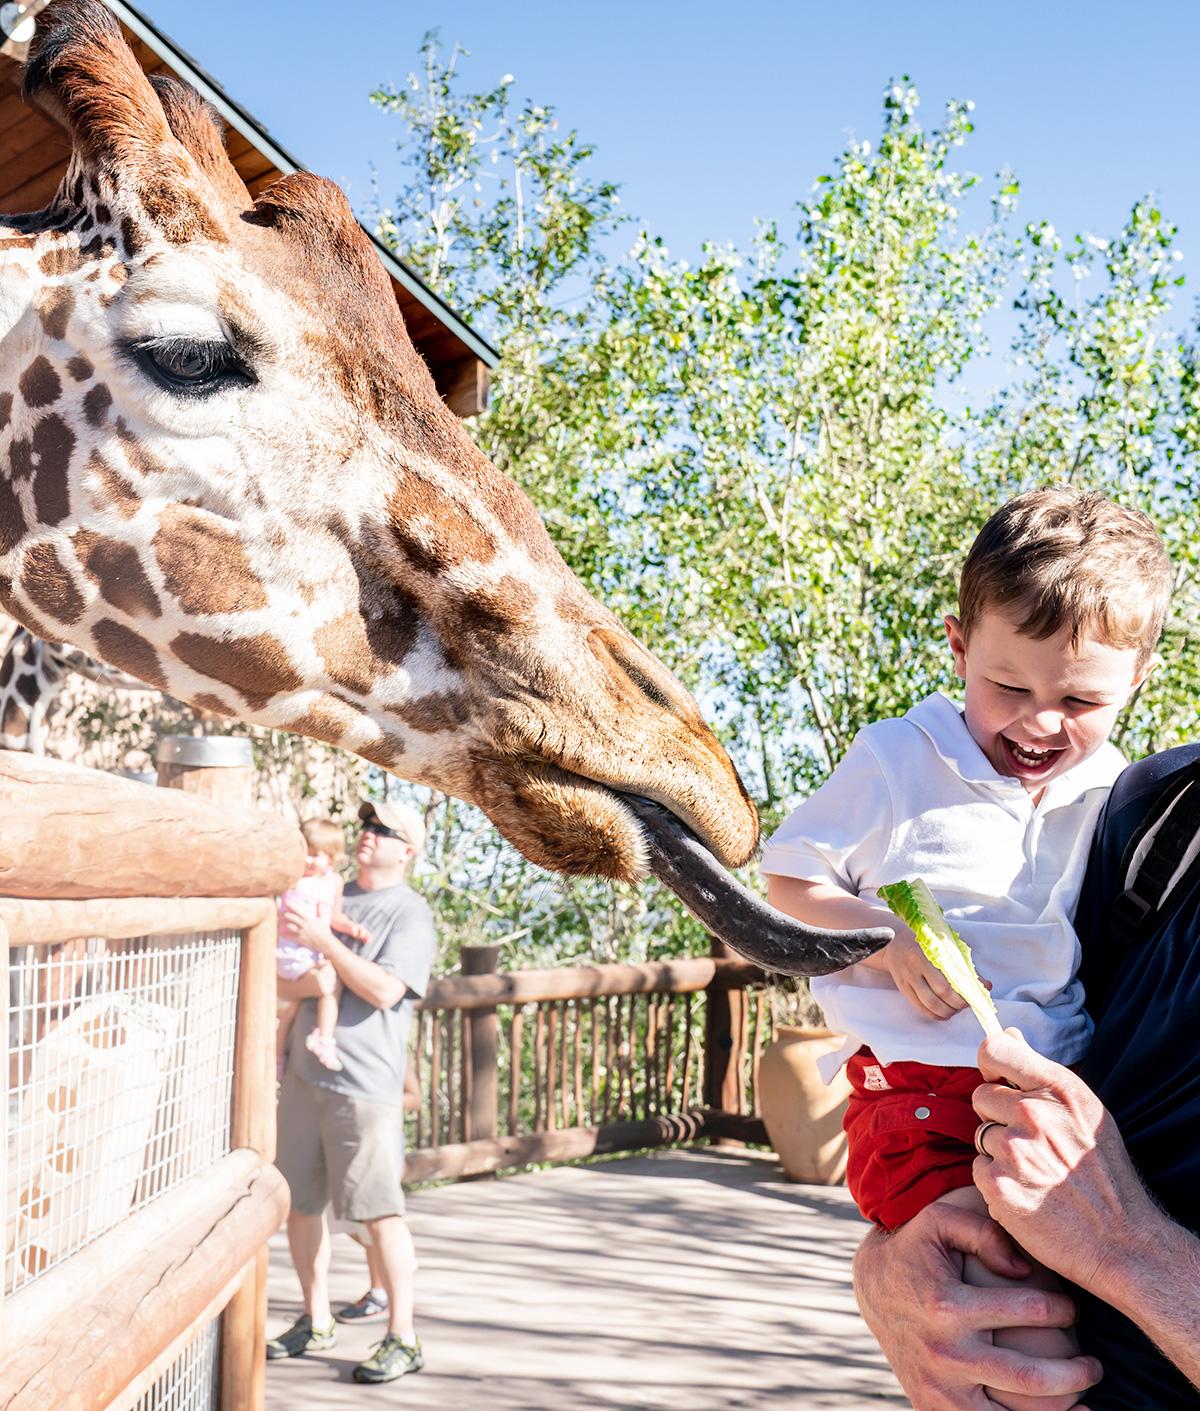 Feeding-Giraffes-Cheyenne-Mountain-Zoo-Colorado-Springs